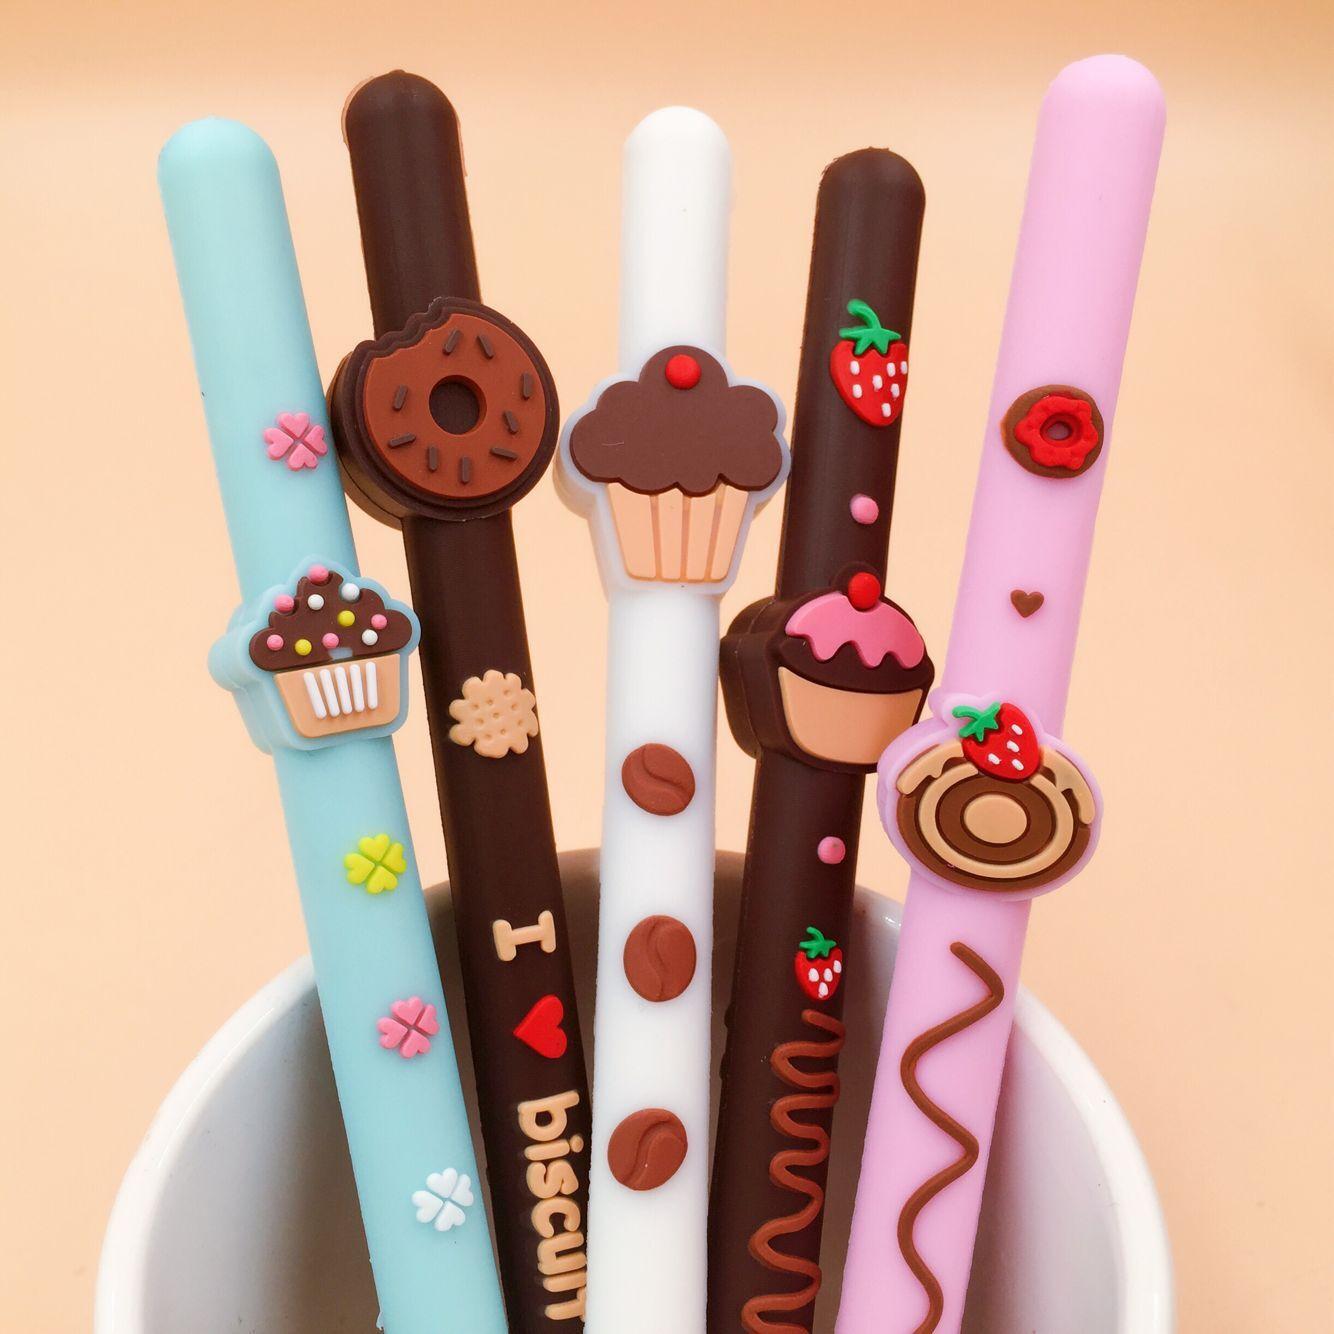 1 Piece Lytwtw s Korean Stationery Cute Biscuit Gel Pen School Office Kawaii Supply Handles Novelty